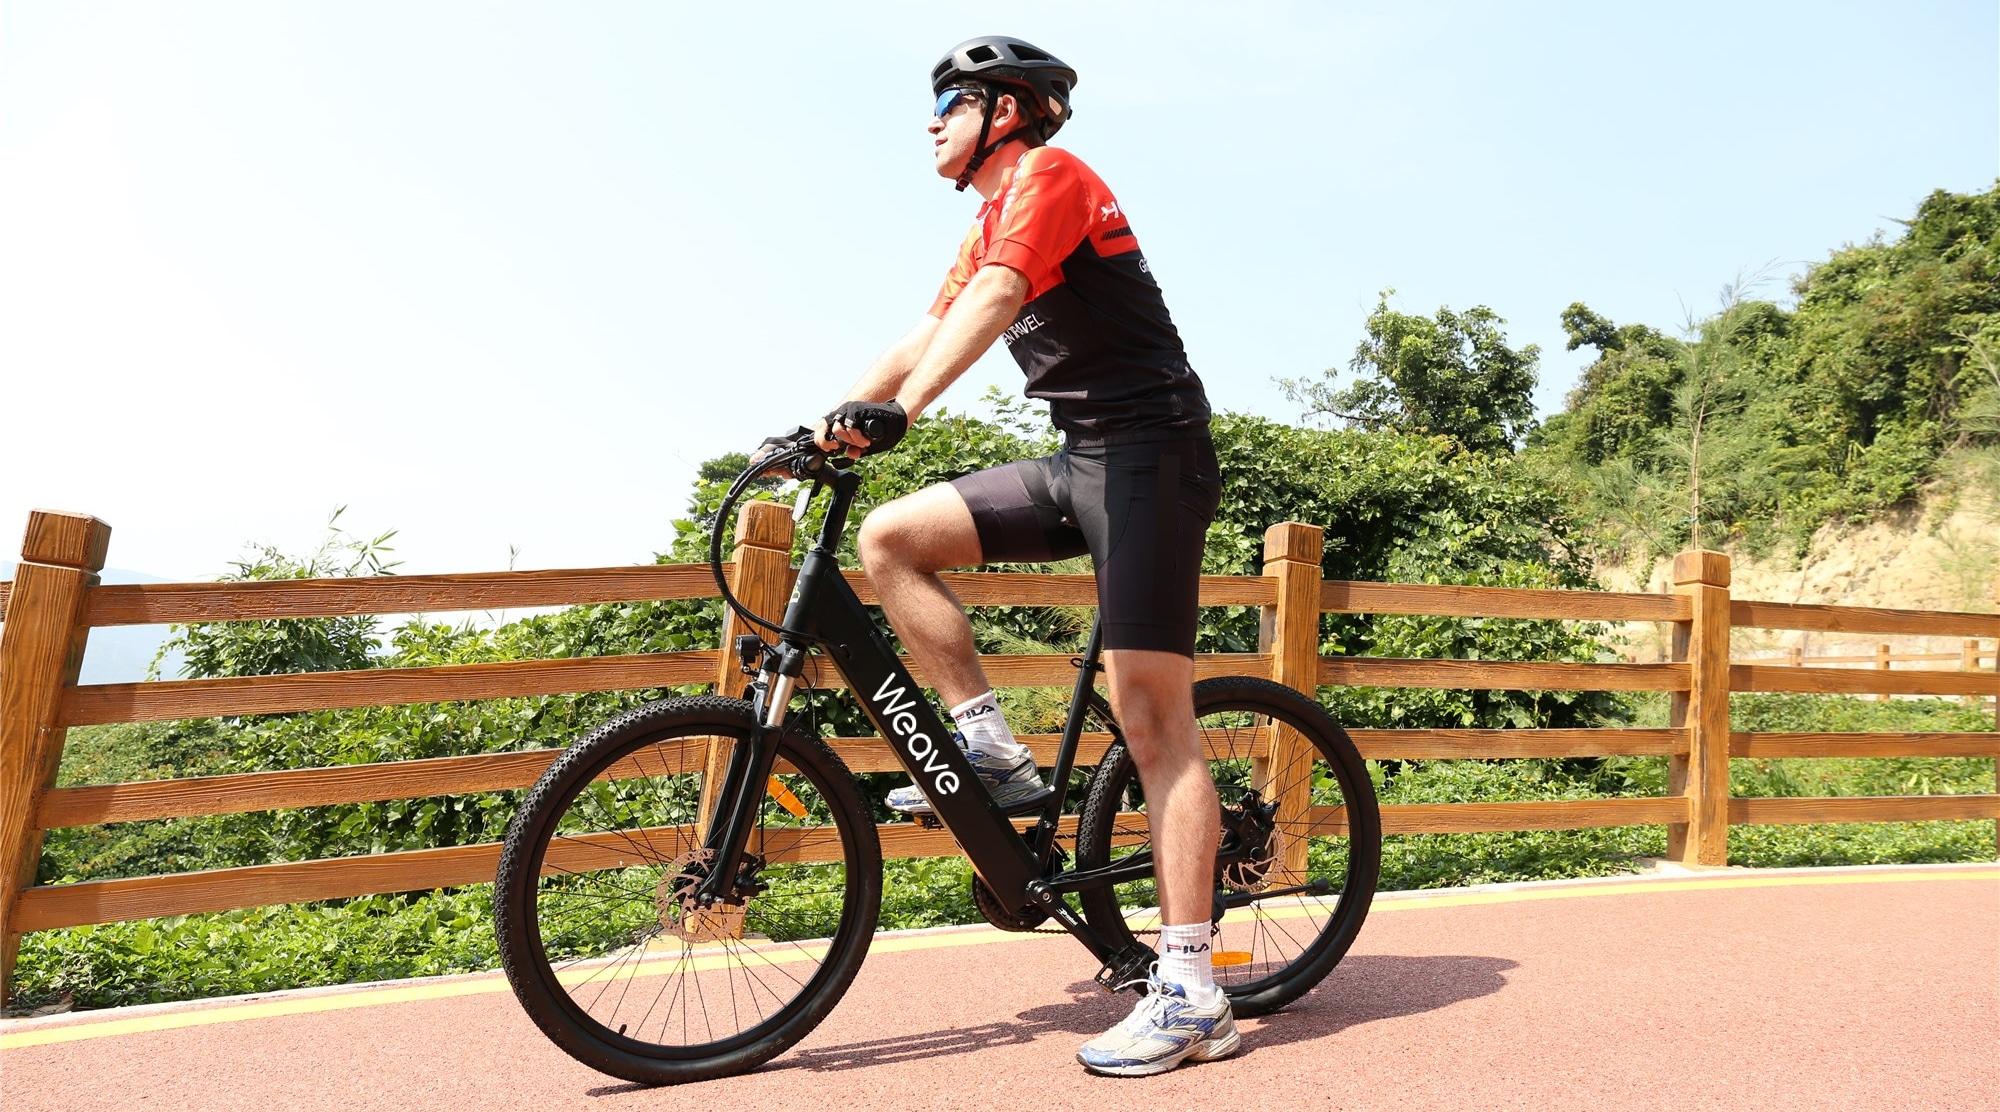 Hero City E-bike